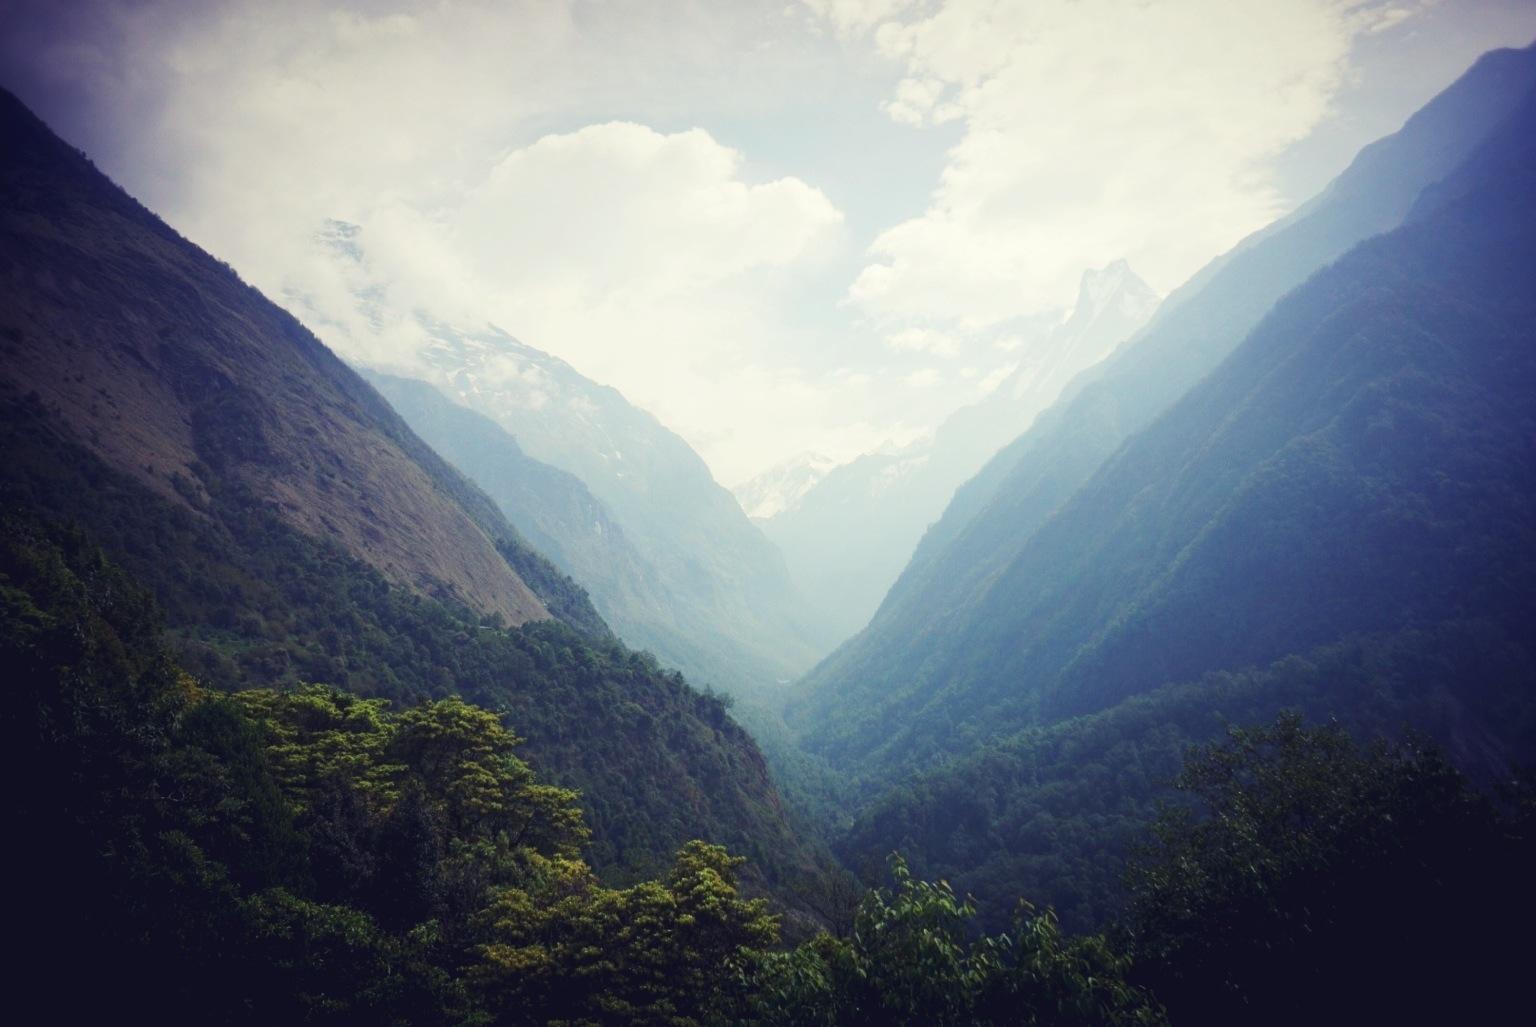 Annapurna valley, looking north